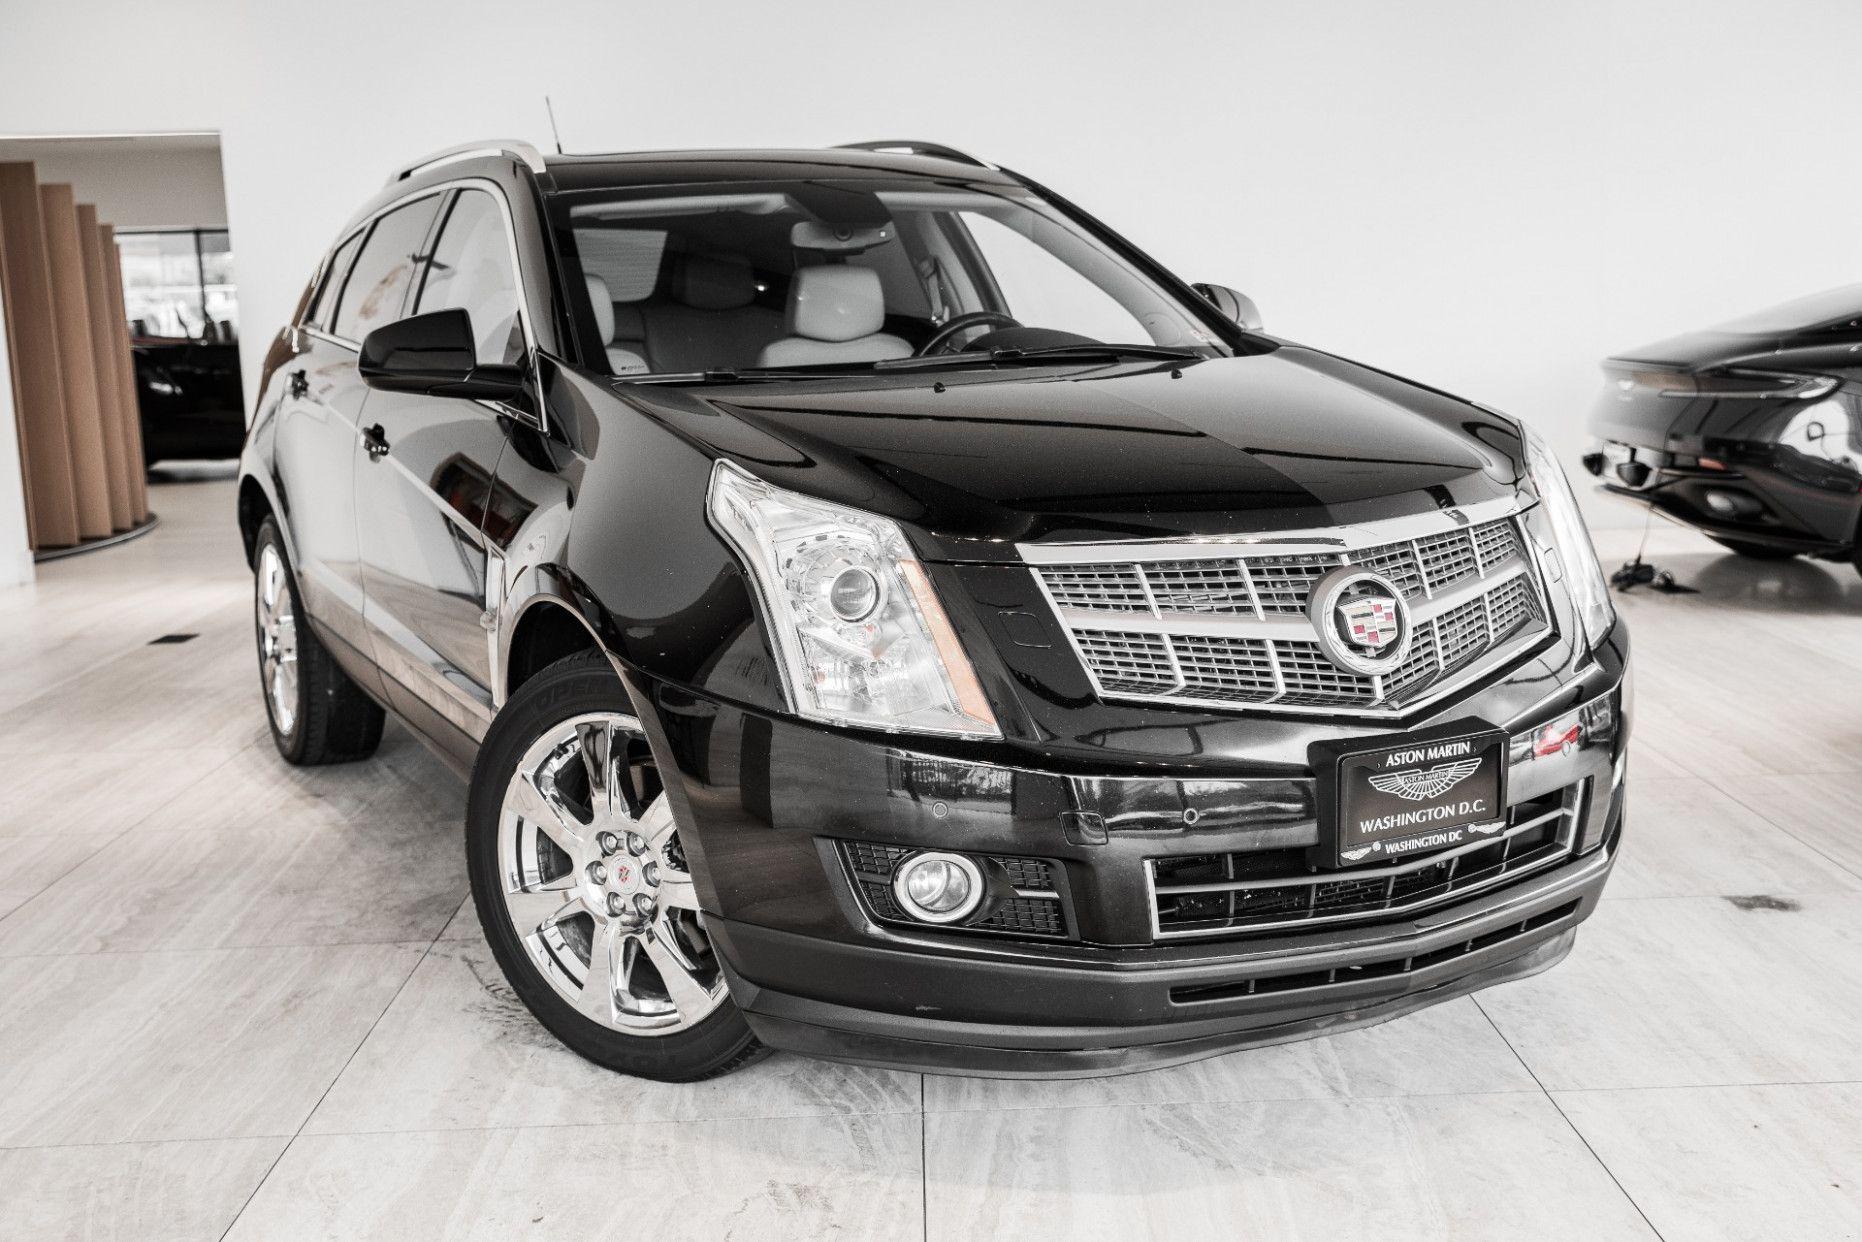 2020 Cadillac SRX Exterior and Interior